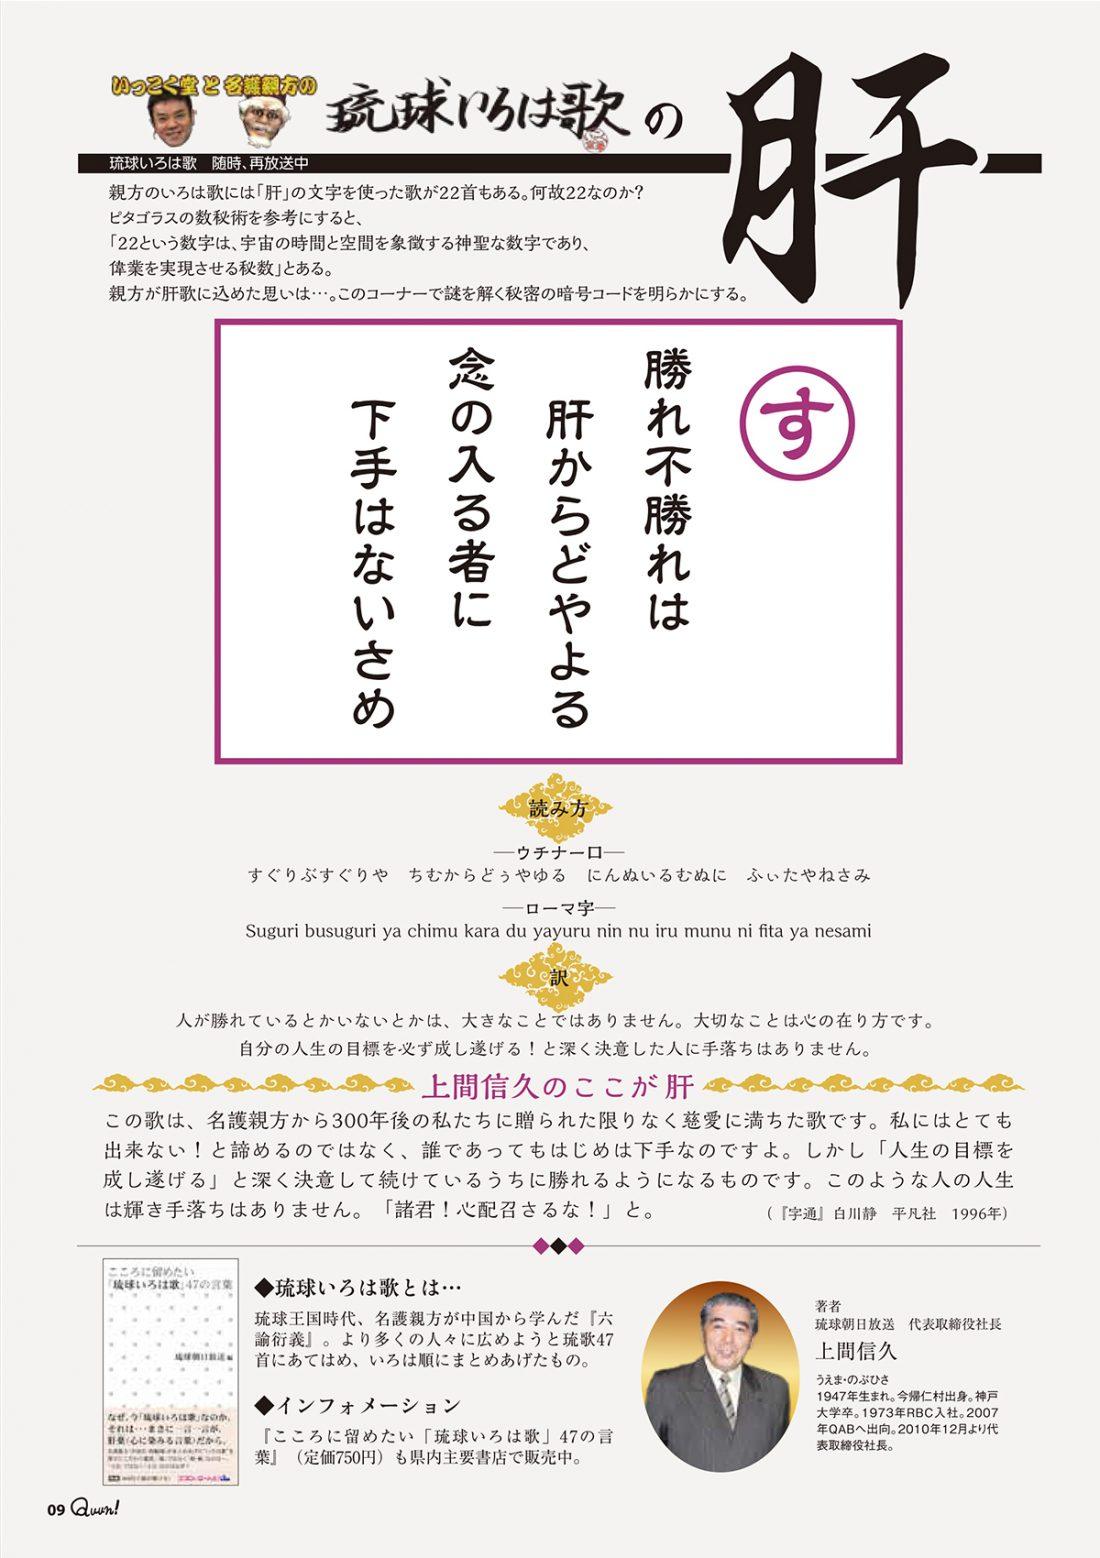 https://www.qab.co.jp/qgoro/wp-content/uploads/quun_0311-1100x1558.jpg